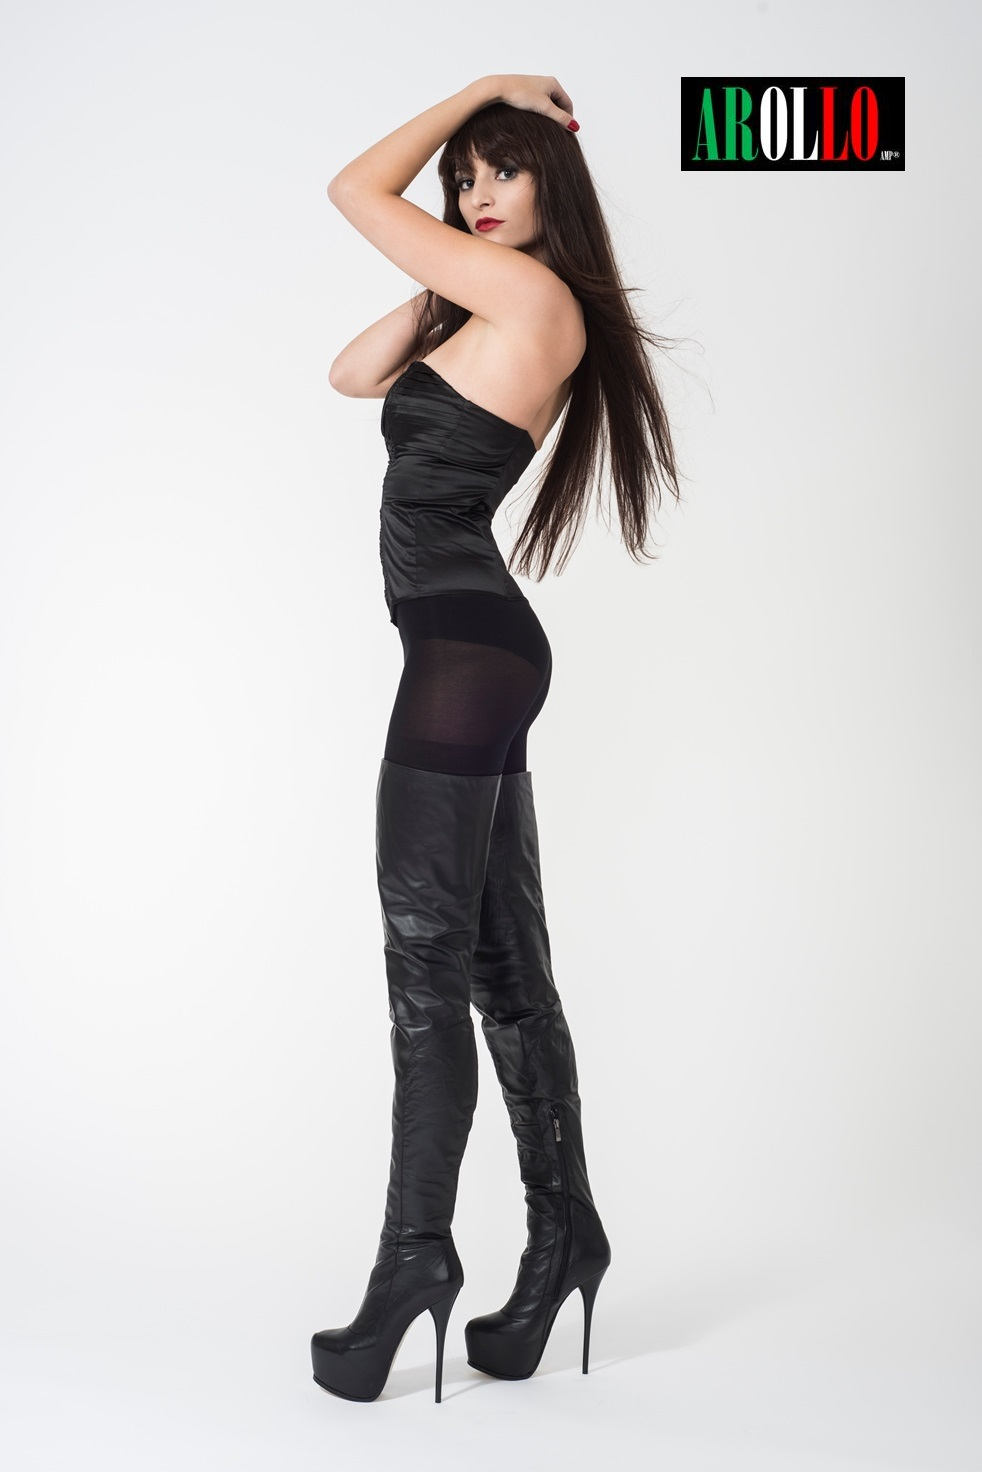 Arollo Leather Heeled Boots Vaness13